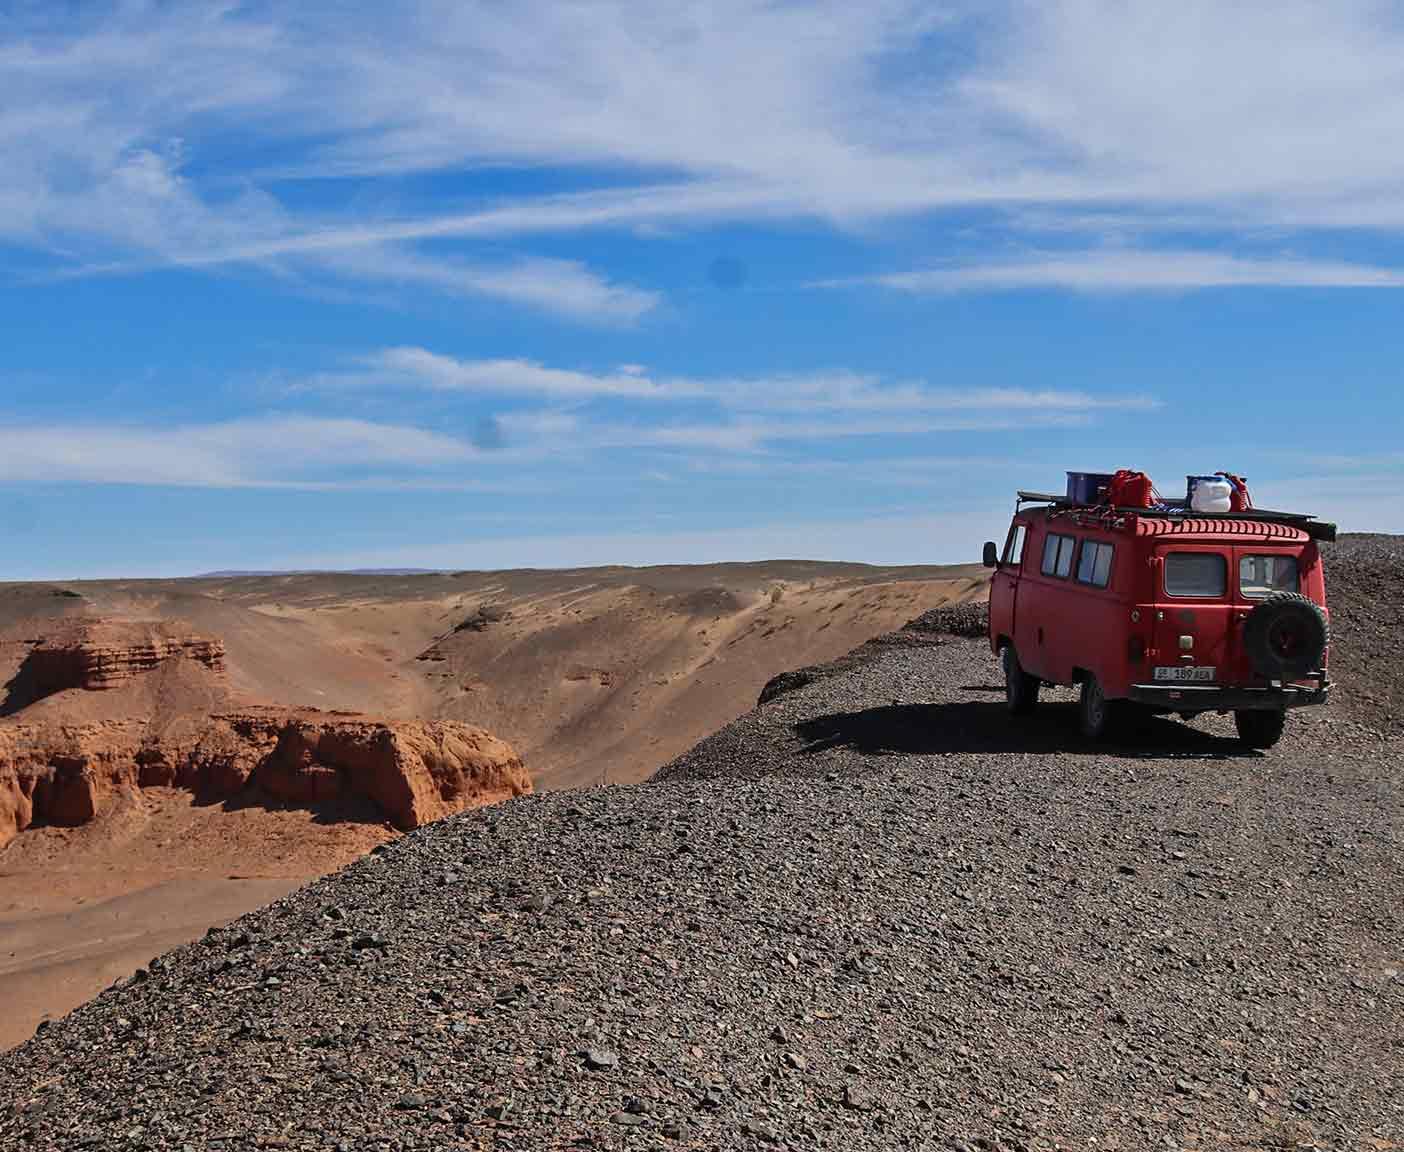 mongolei-reise-piste-camper-gobi-wueste-desert-abenteuer-expedition-4x4